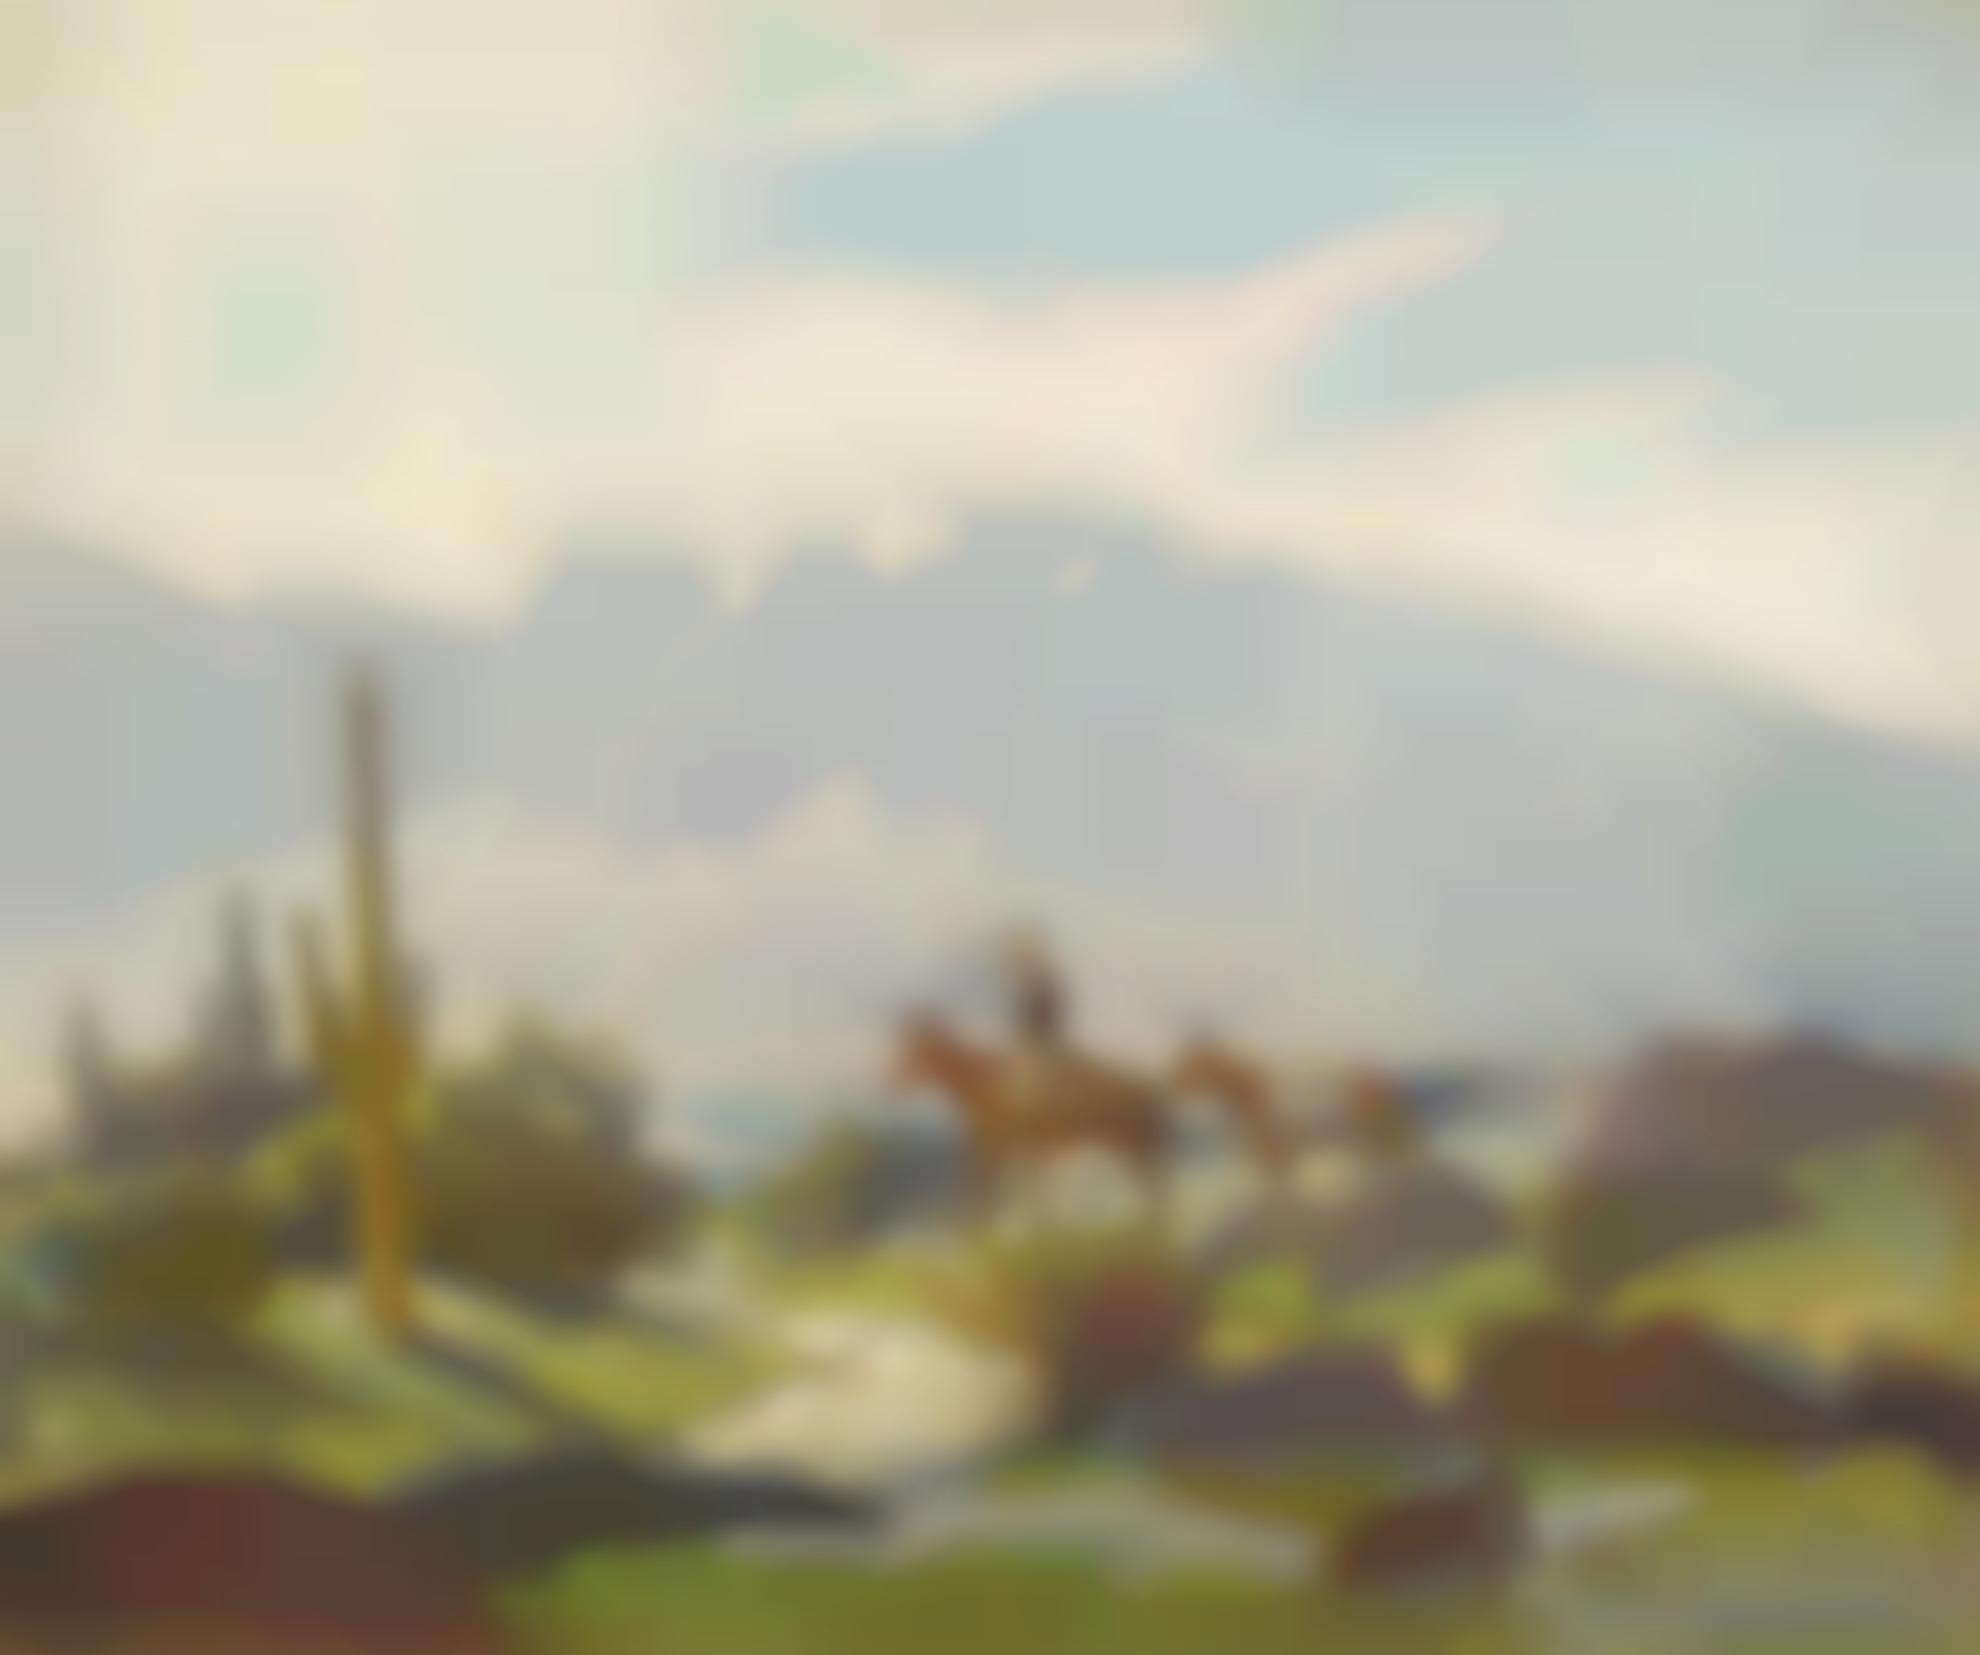 Jack Wilkinson Smith - Horseback With Cactus-